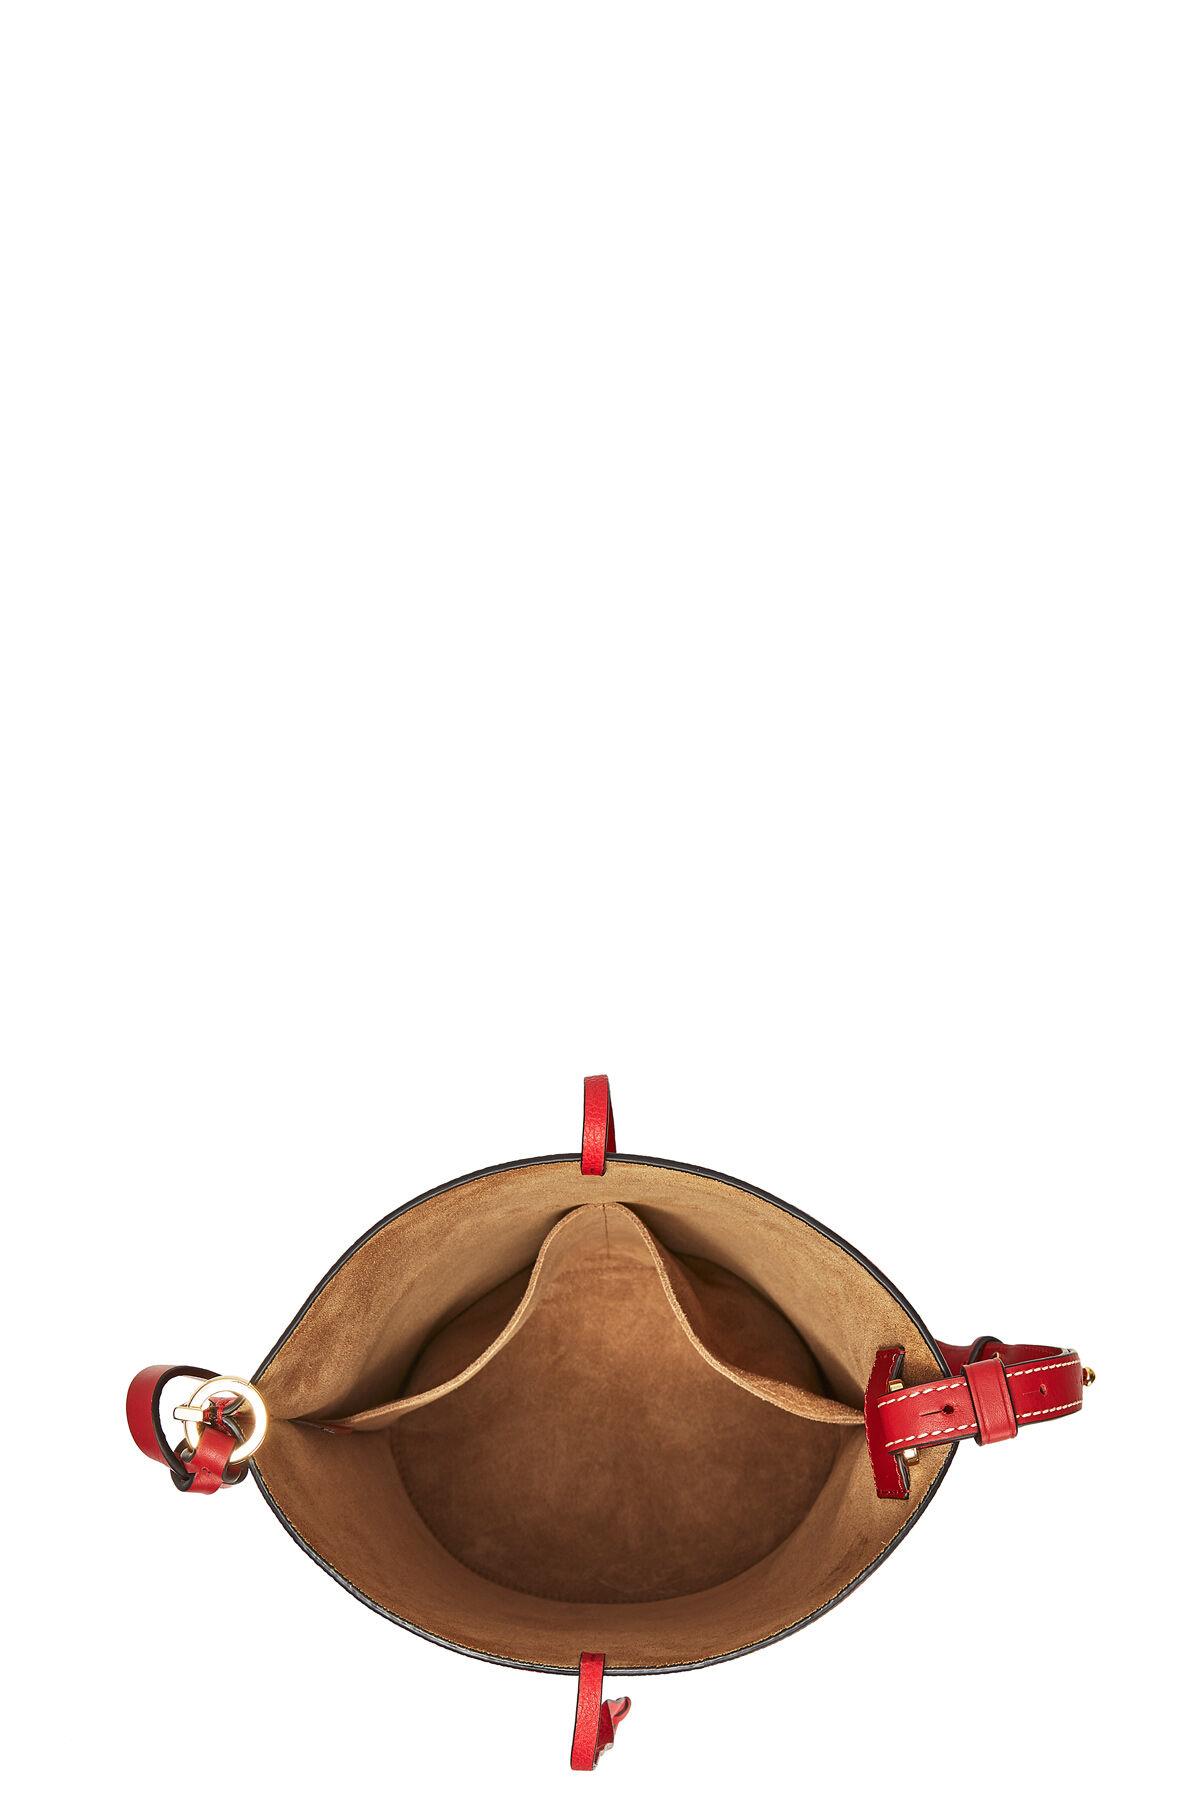 LOEWE Bolso Gate Bucket Rojo Escarlata/Rojo Tostado all